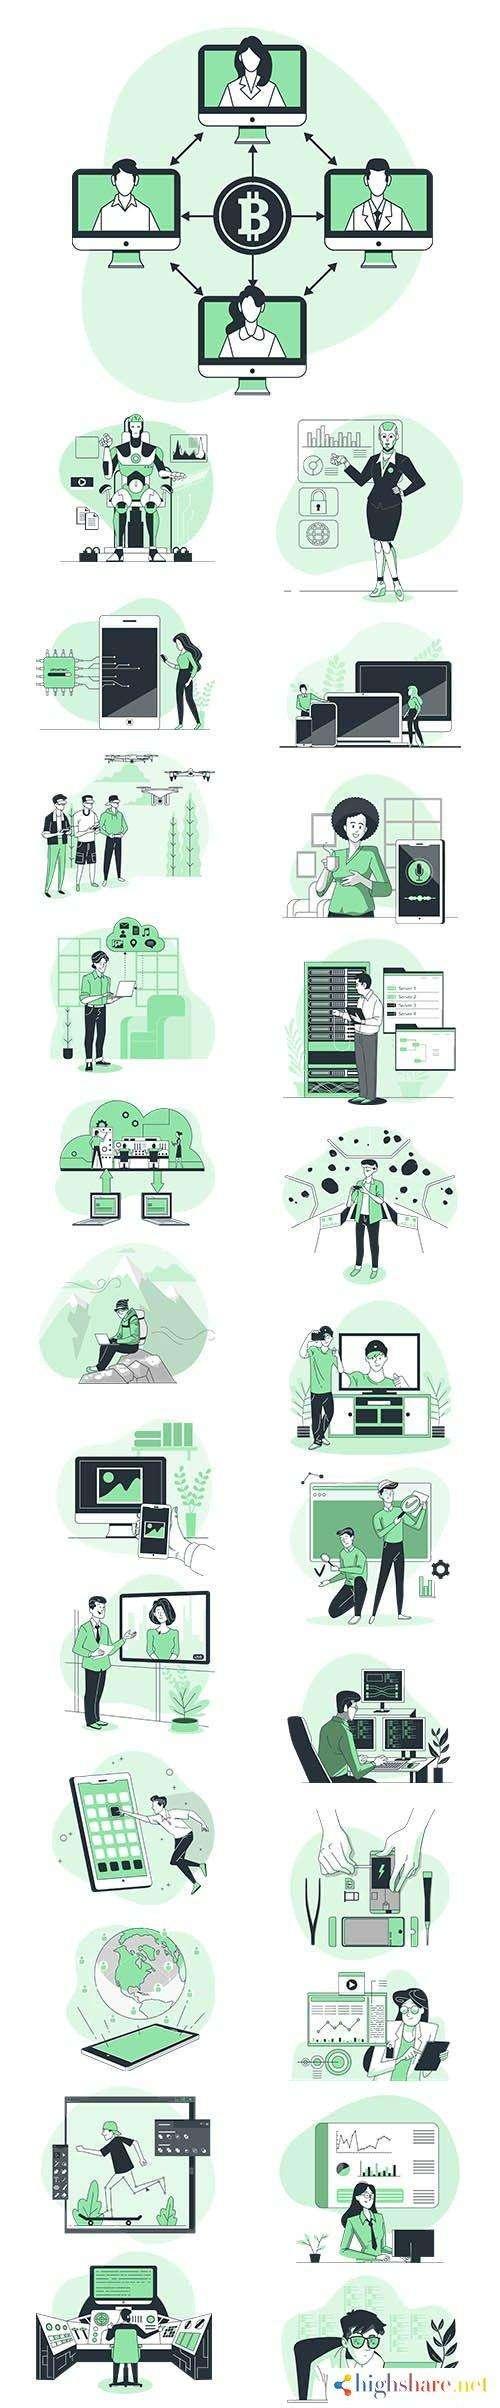 vector illustrations technology concept 5f42821c5e8b1 - Vector Illustrations Technology Concept